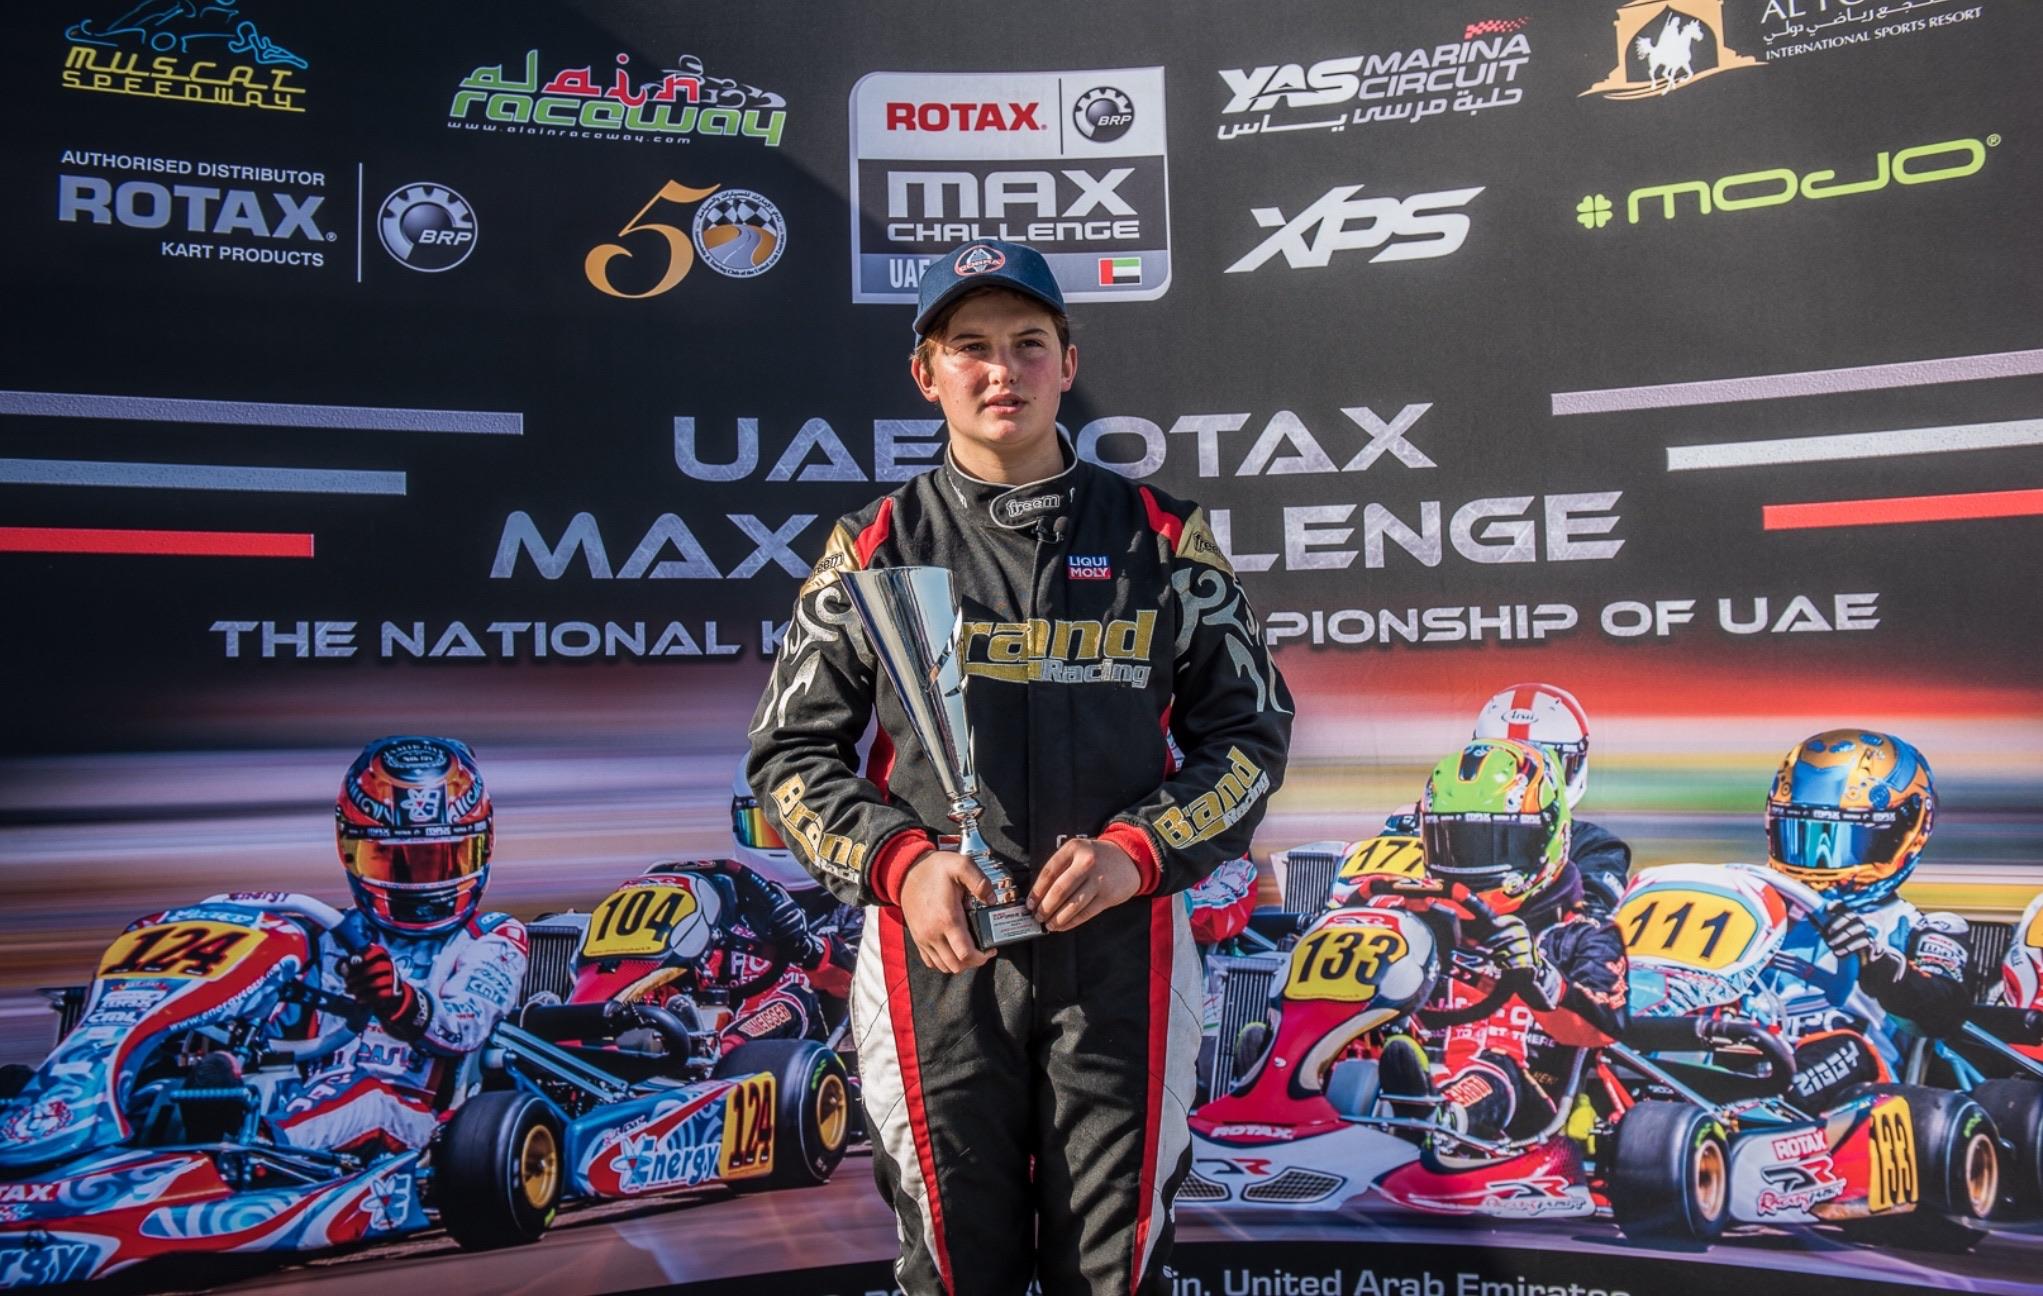 Formula 4 Sponsorship - Rotax Champion